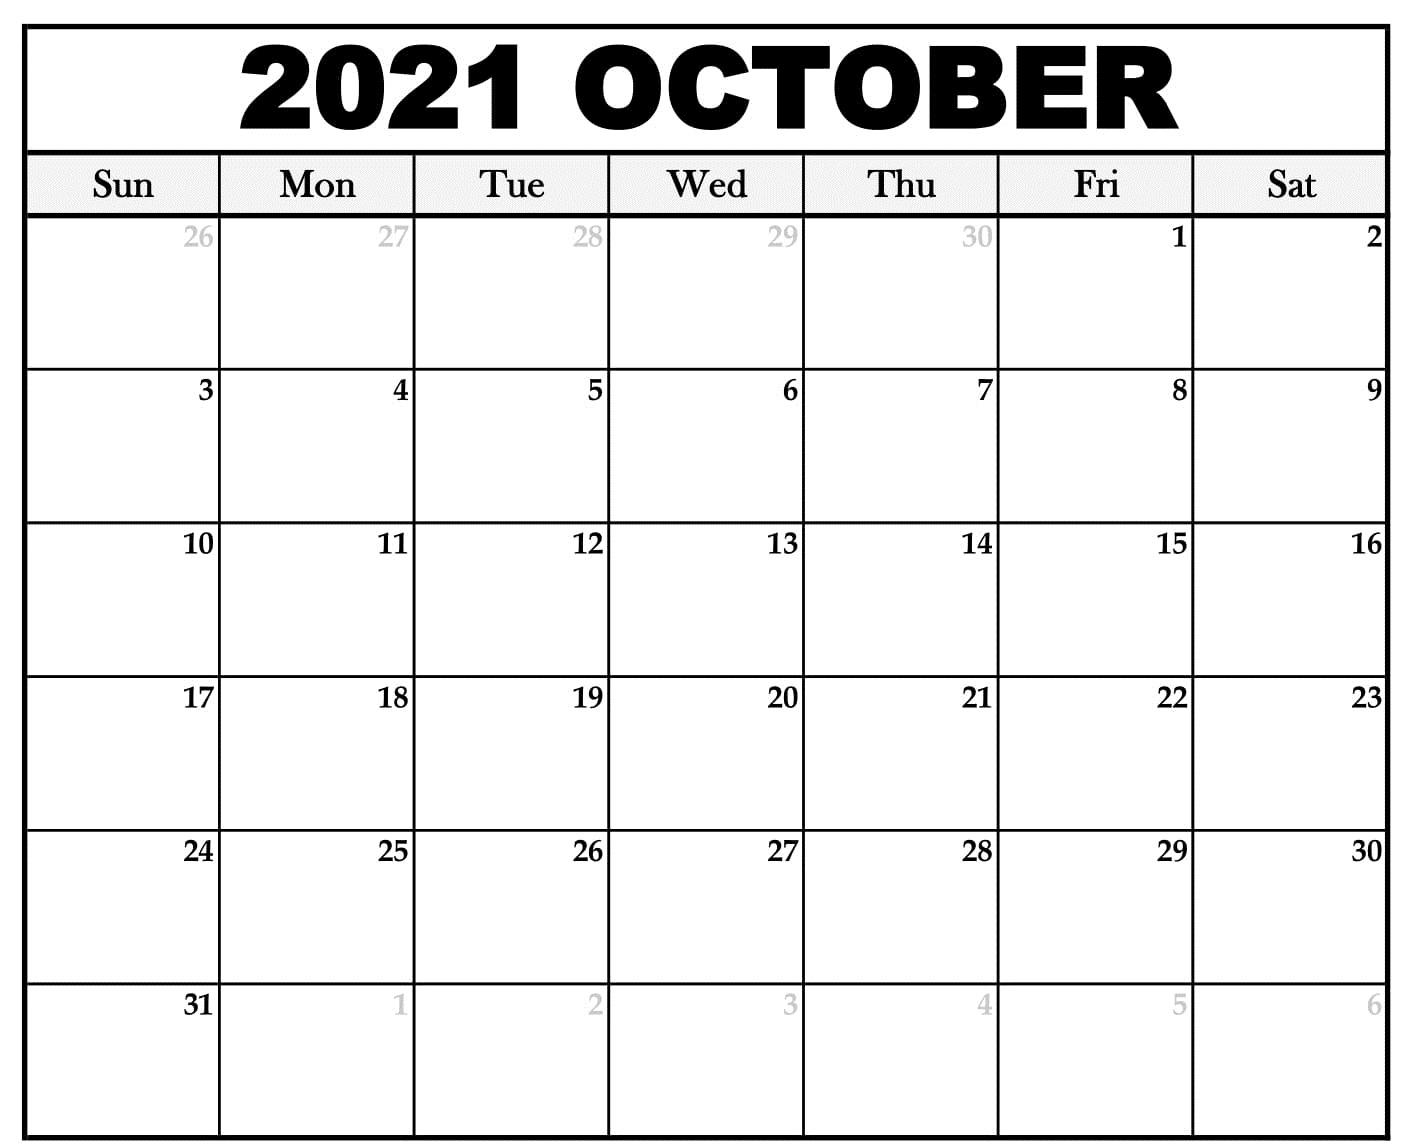 Blank October 2021 Calendar Template